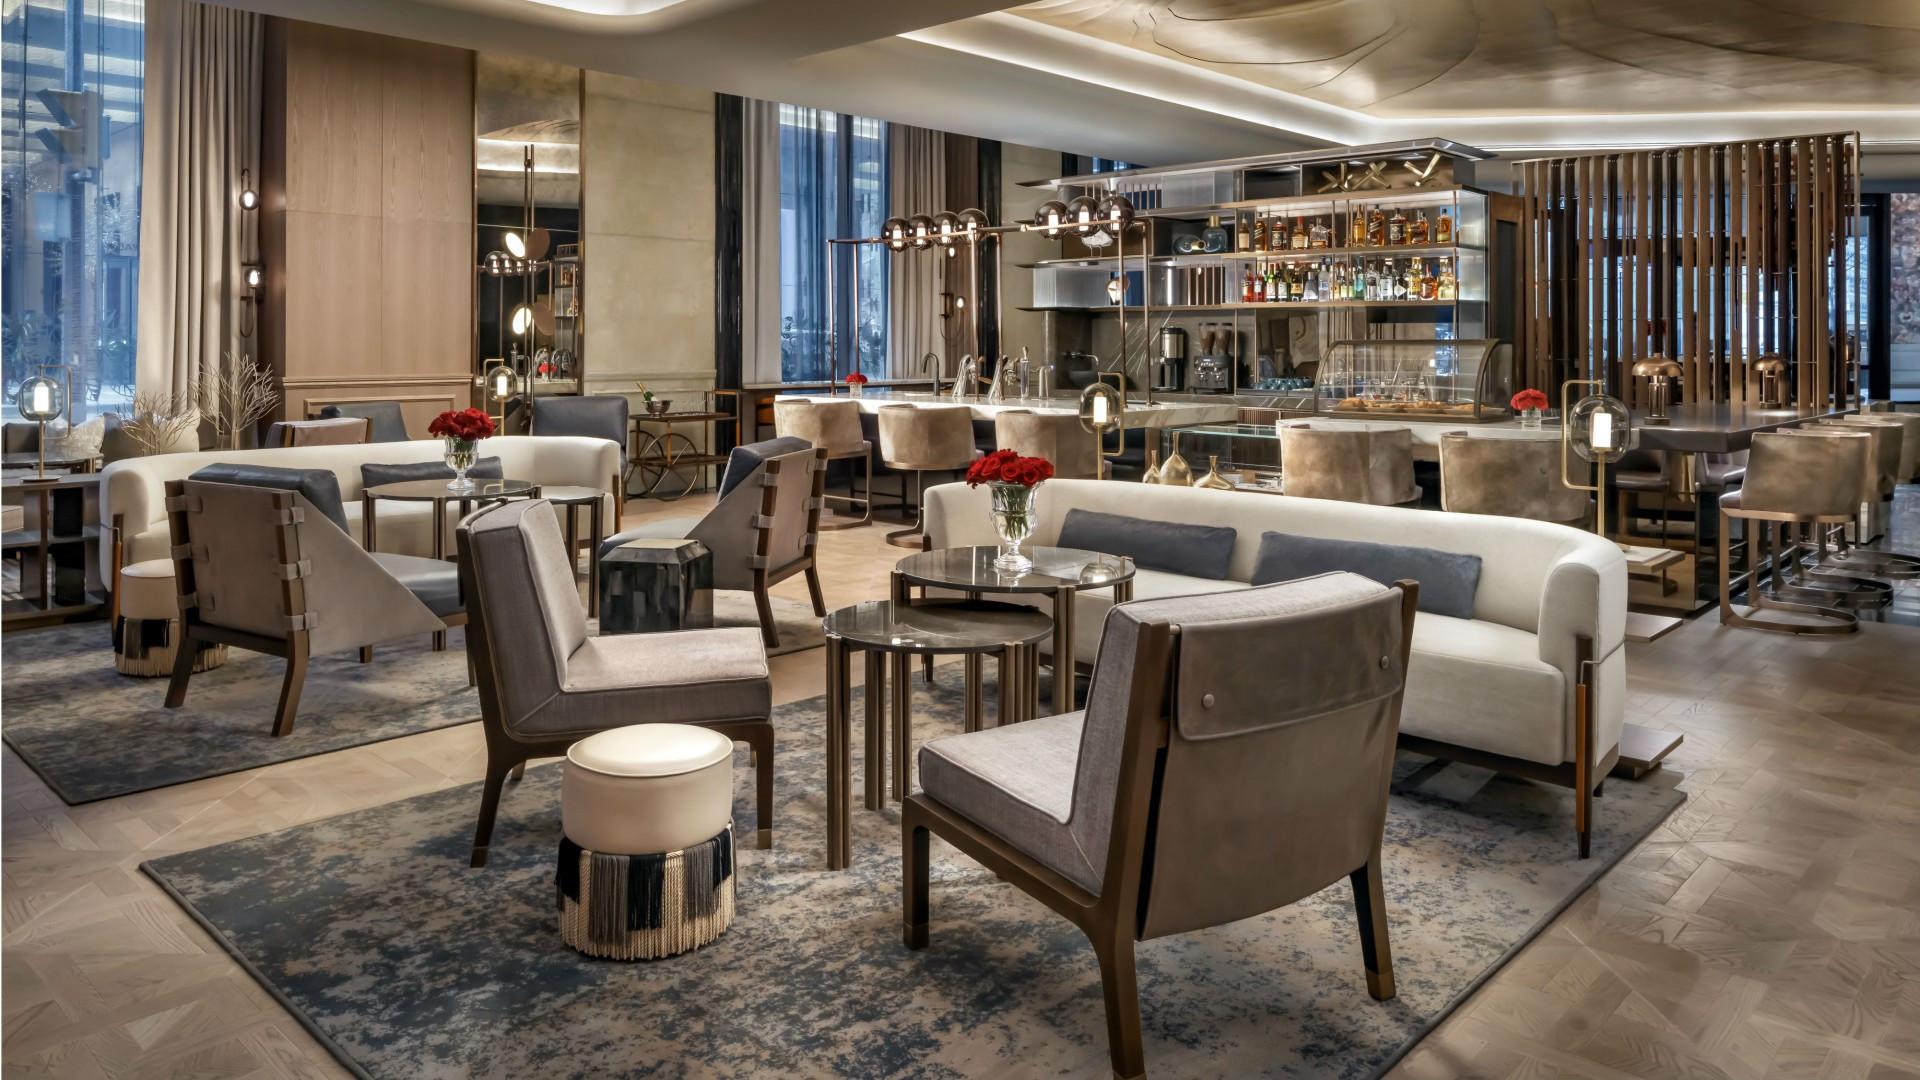 Best hotels Toronto staycation | The St. Regis Hotel lobby bar